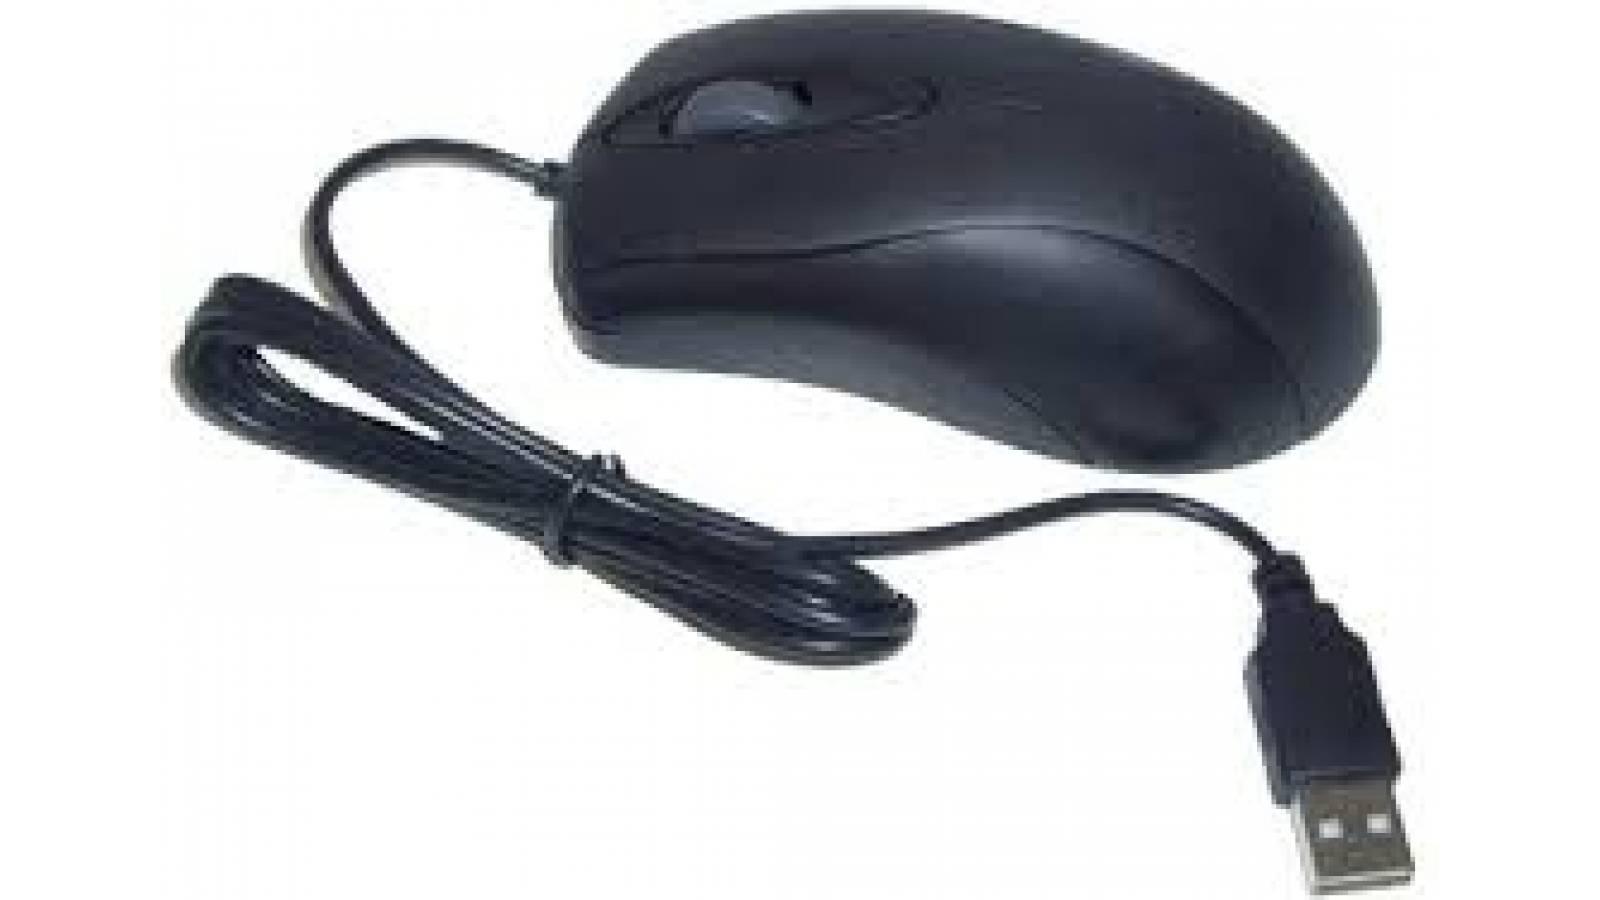 MOUSE USB OPTICO,MARCAS VARIAS